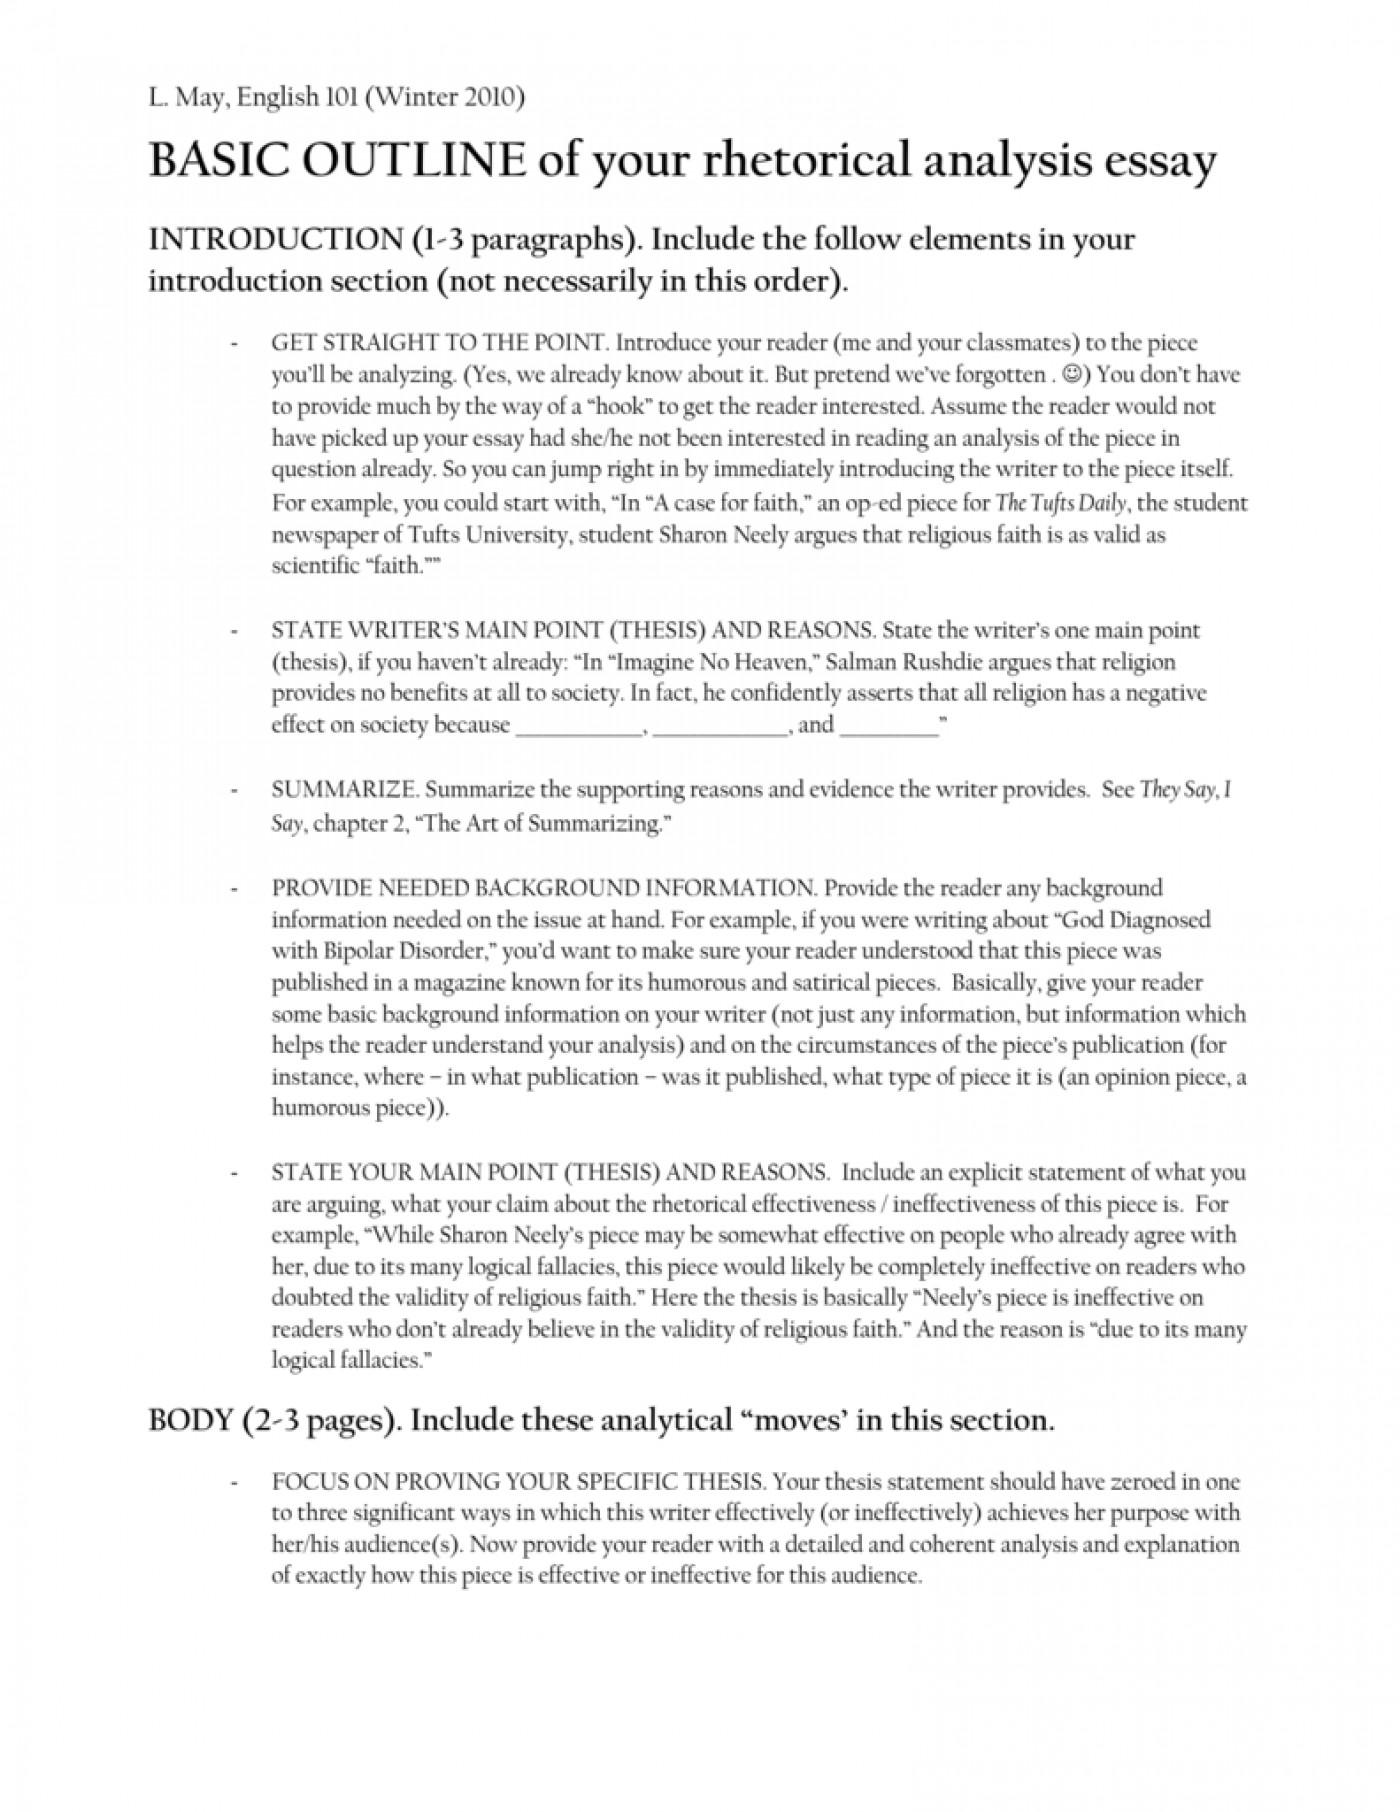 Rhetorical analysis essay help